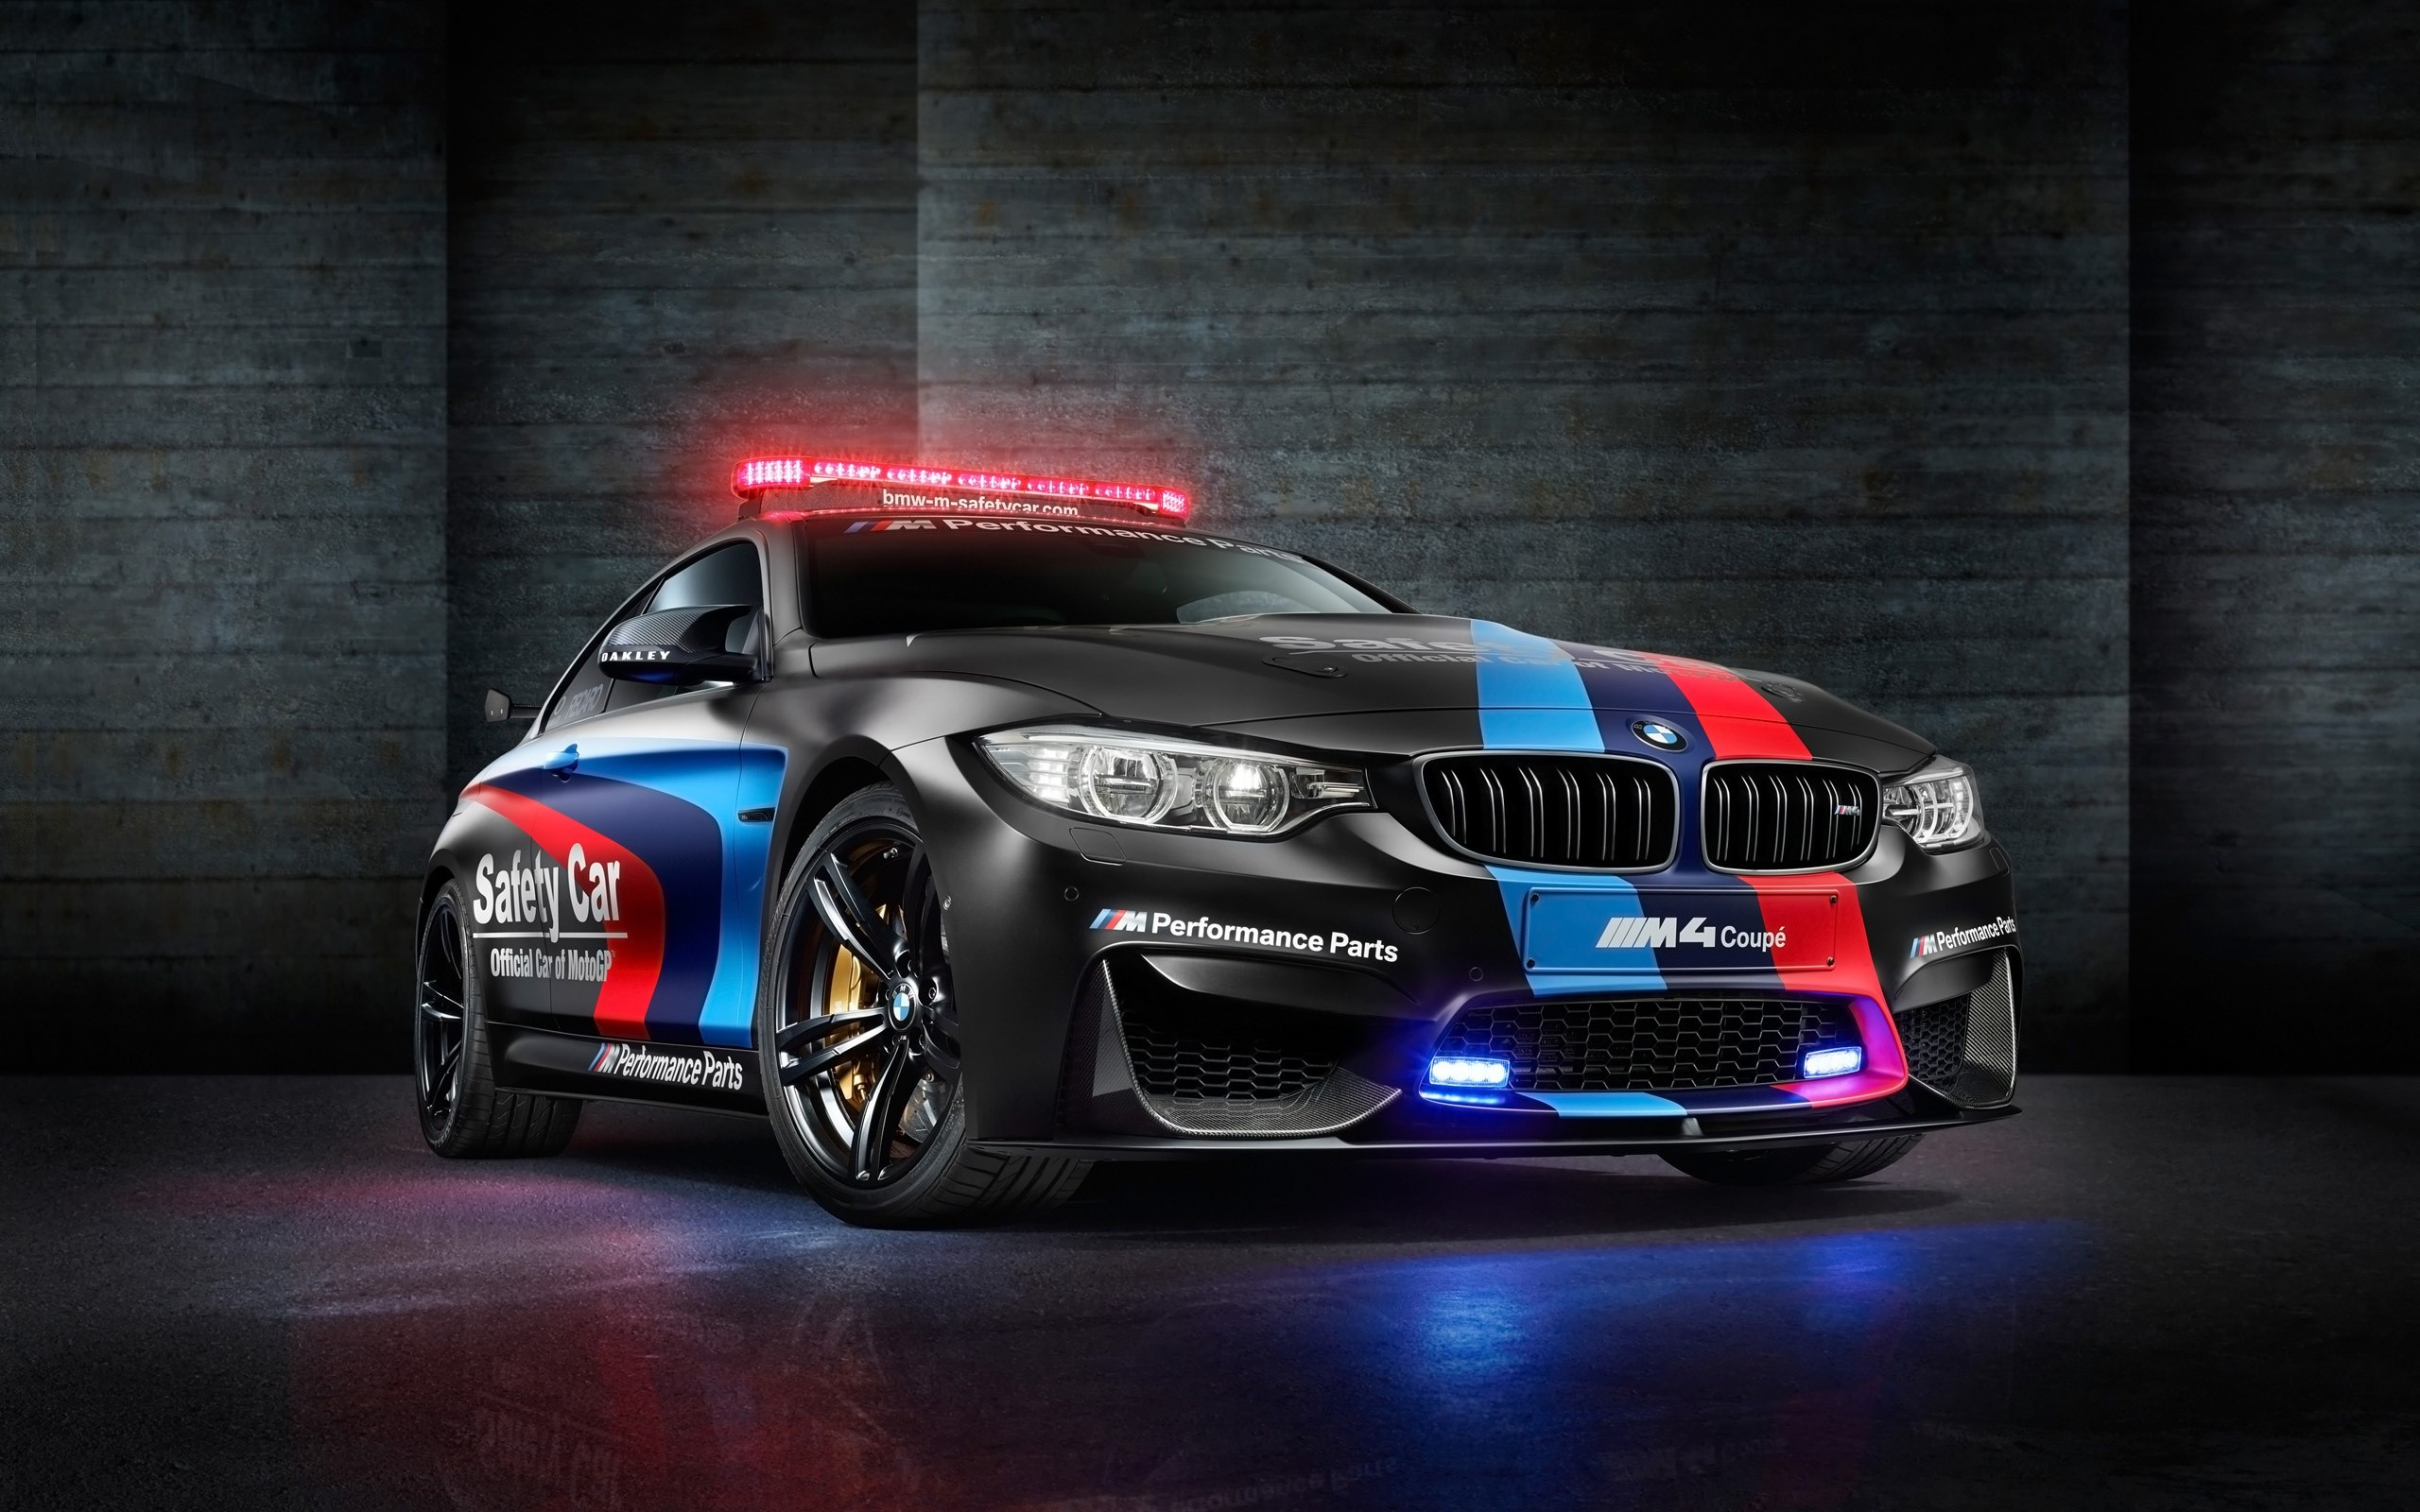 Fondos de pantalla BMW M4 motoGP safety car